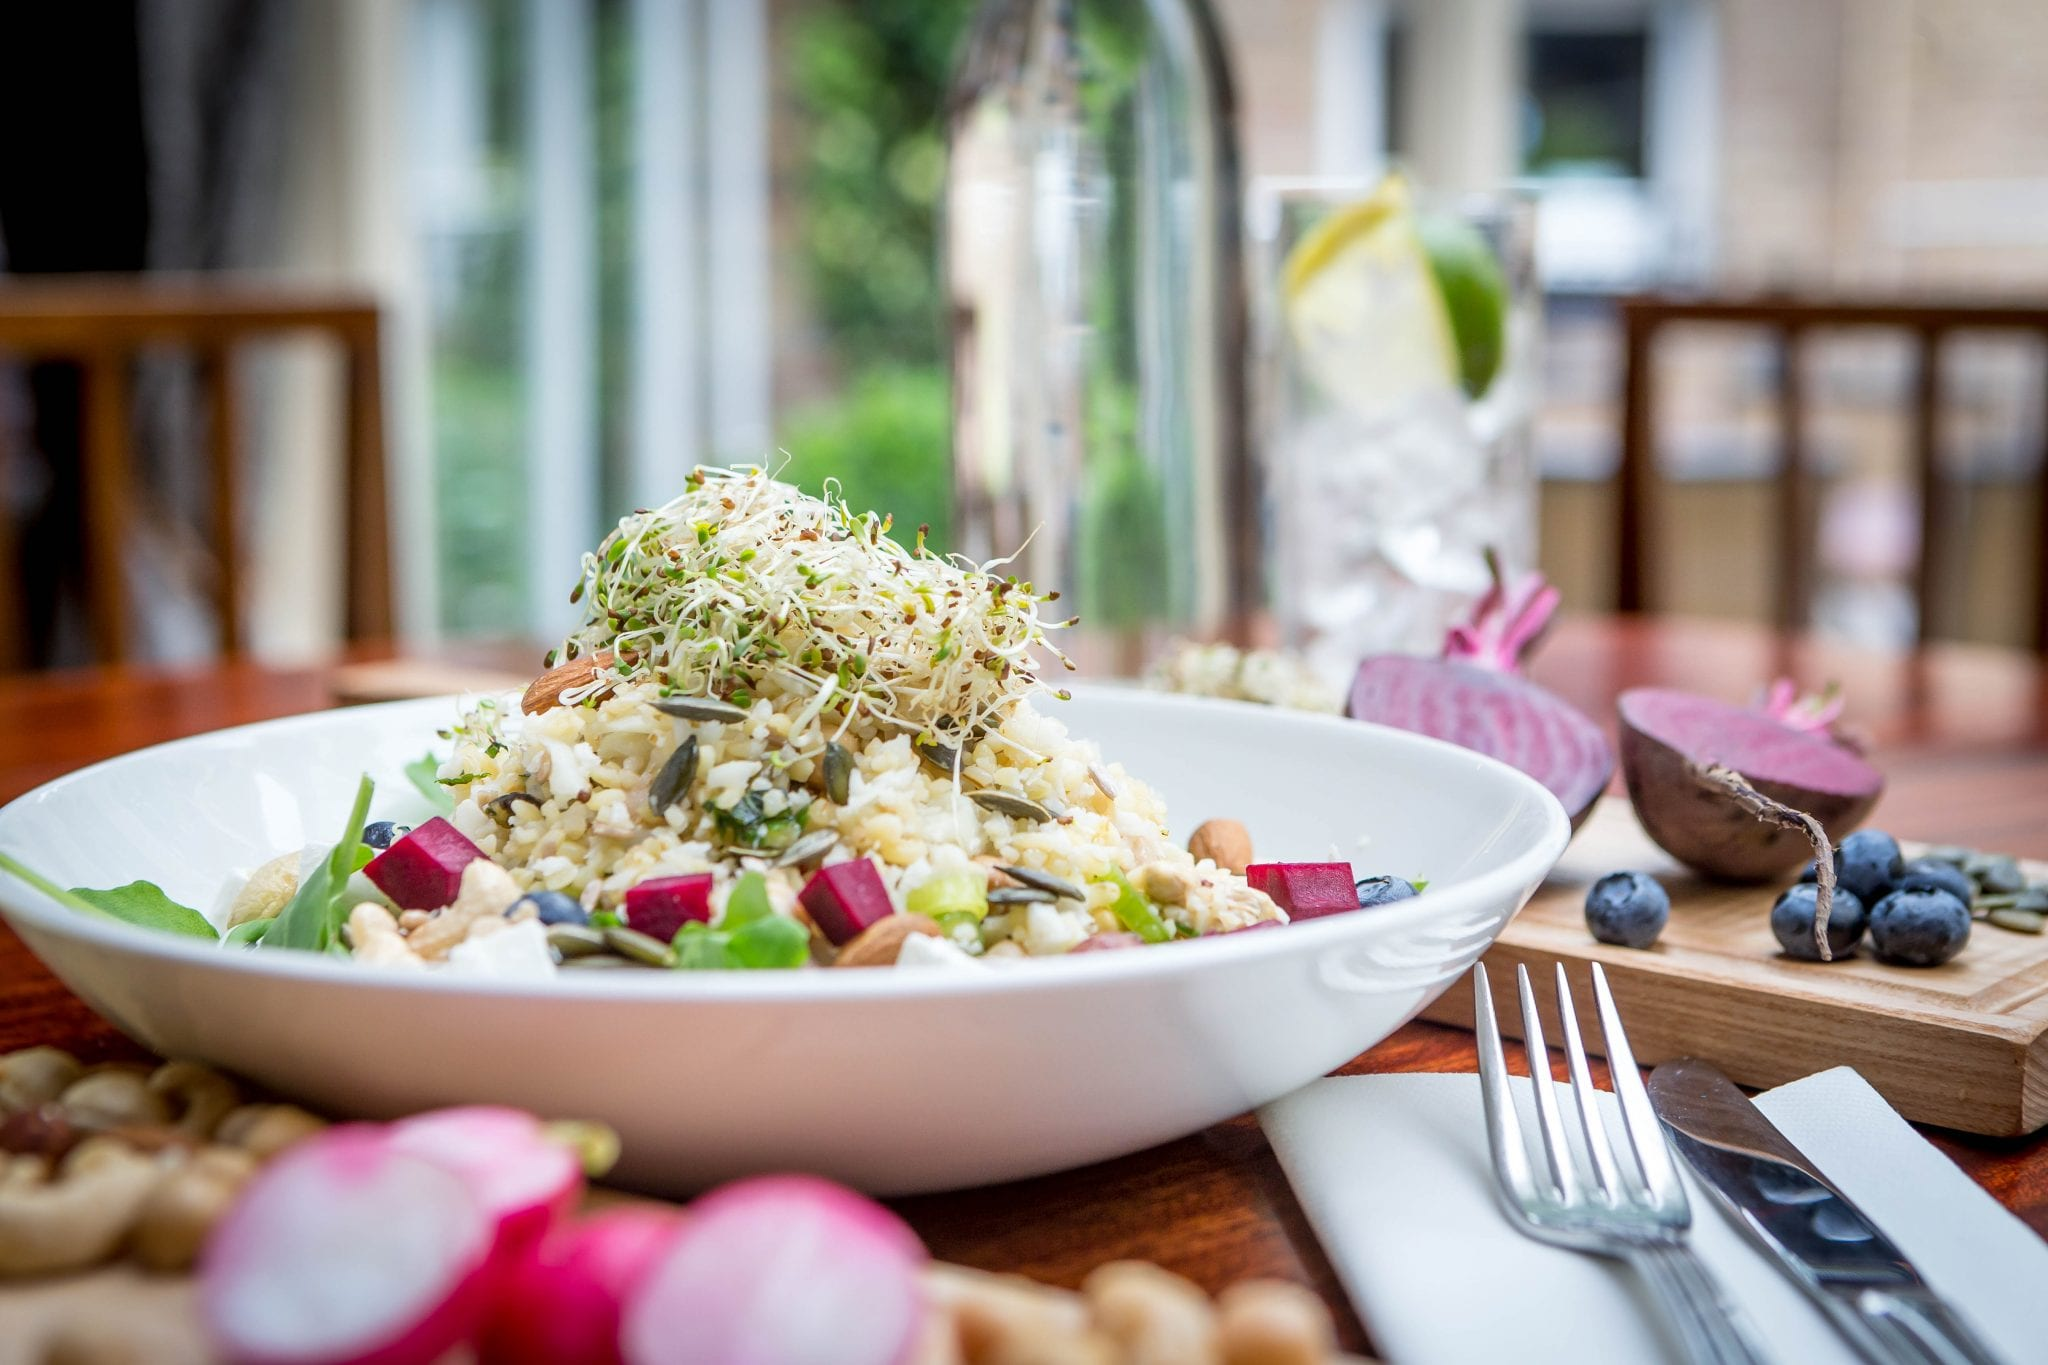 Superfood salad served at Grill Restaurant